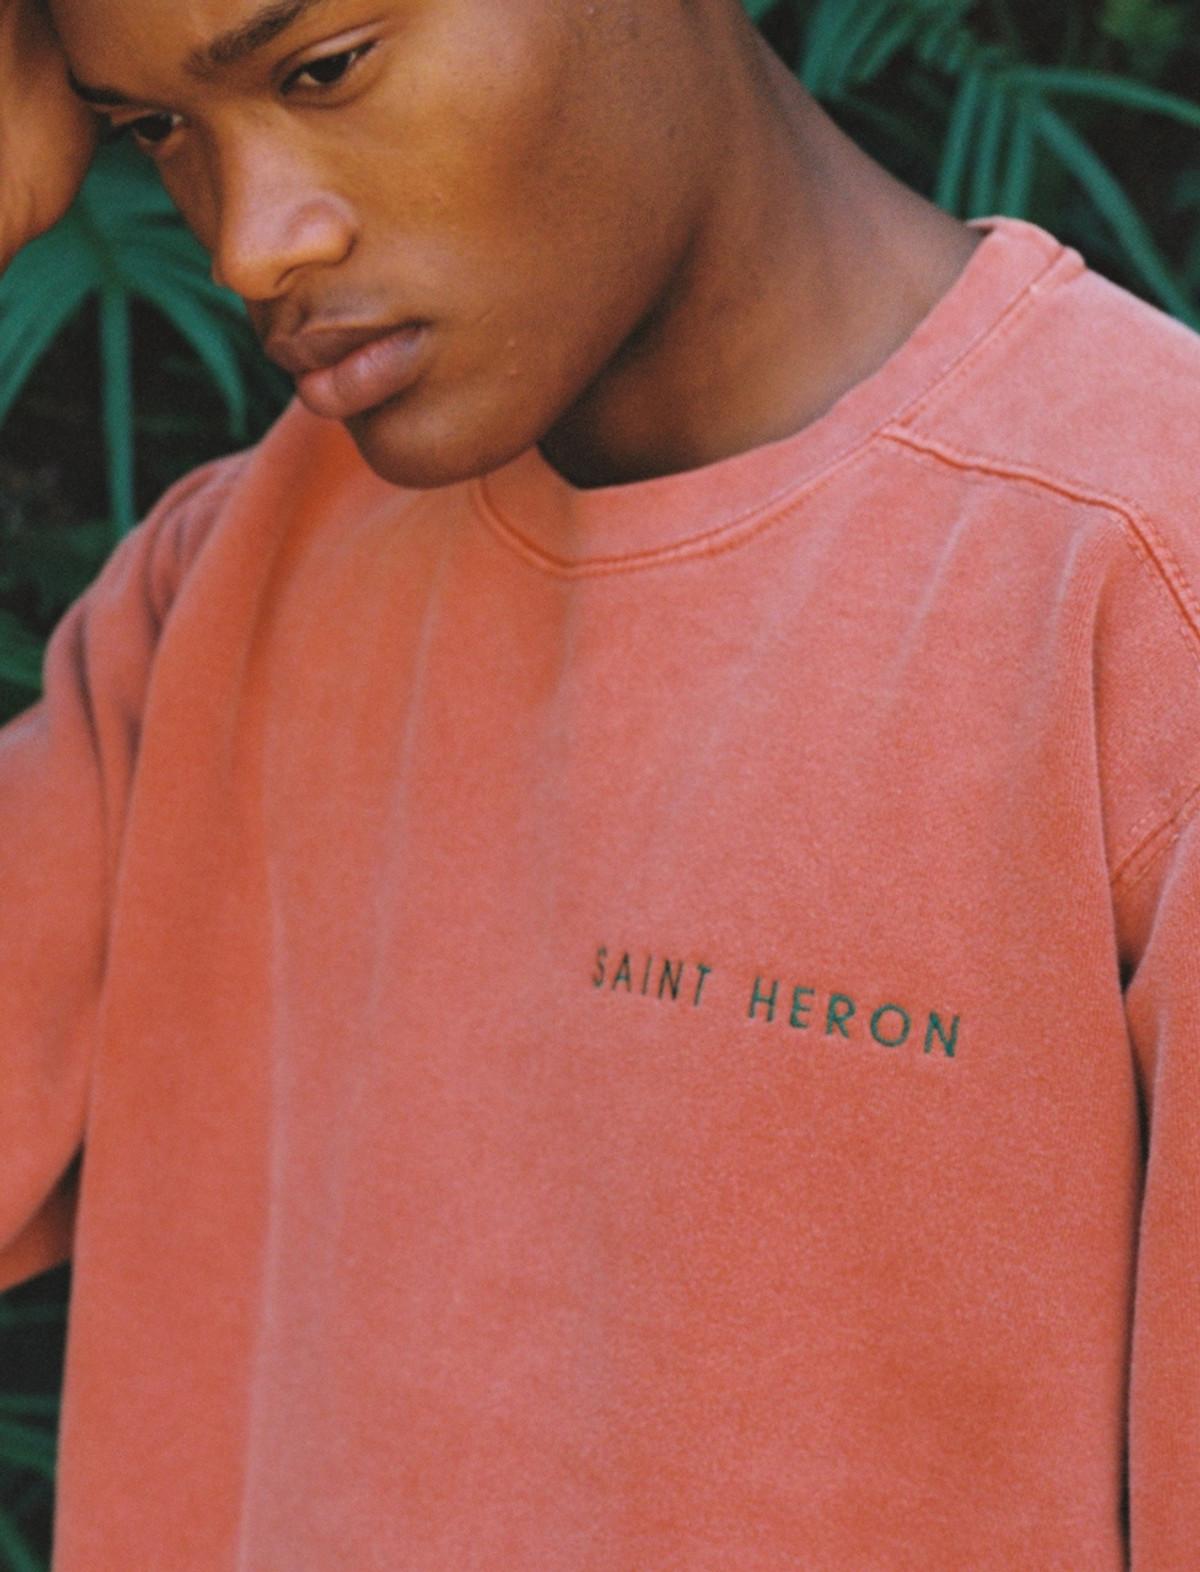 SAINT HERON UNISEX CREWNECK SWEATSHIRT - YAM/EMERALD